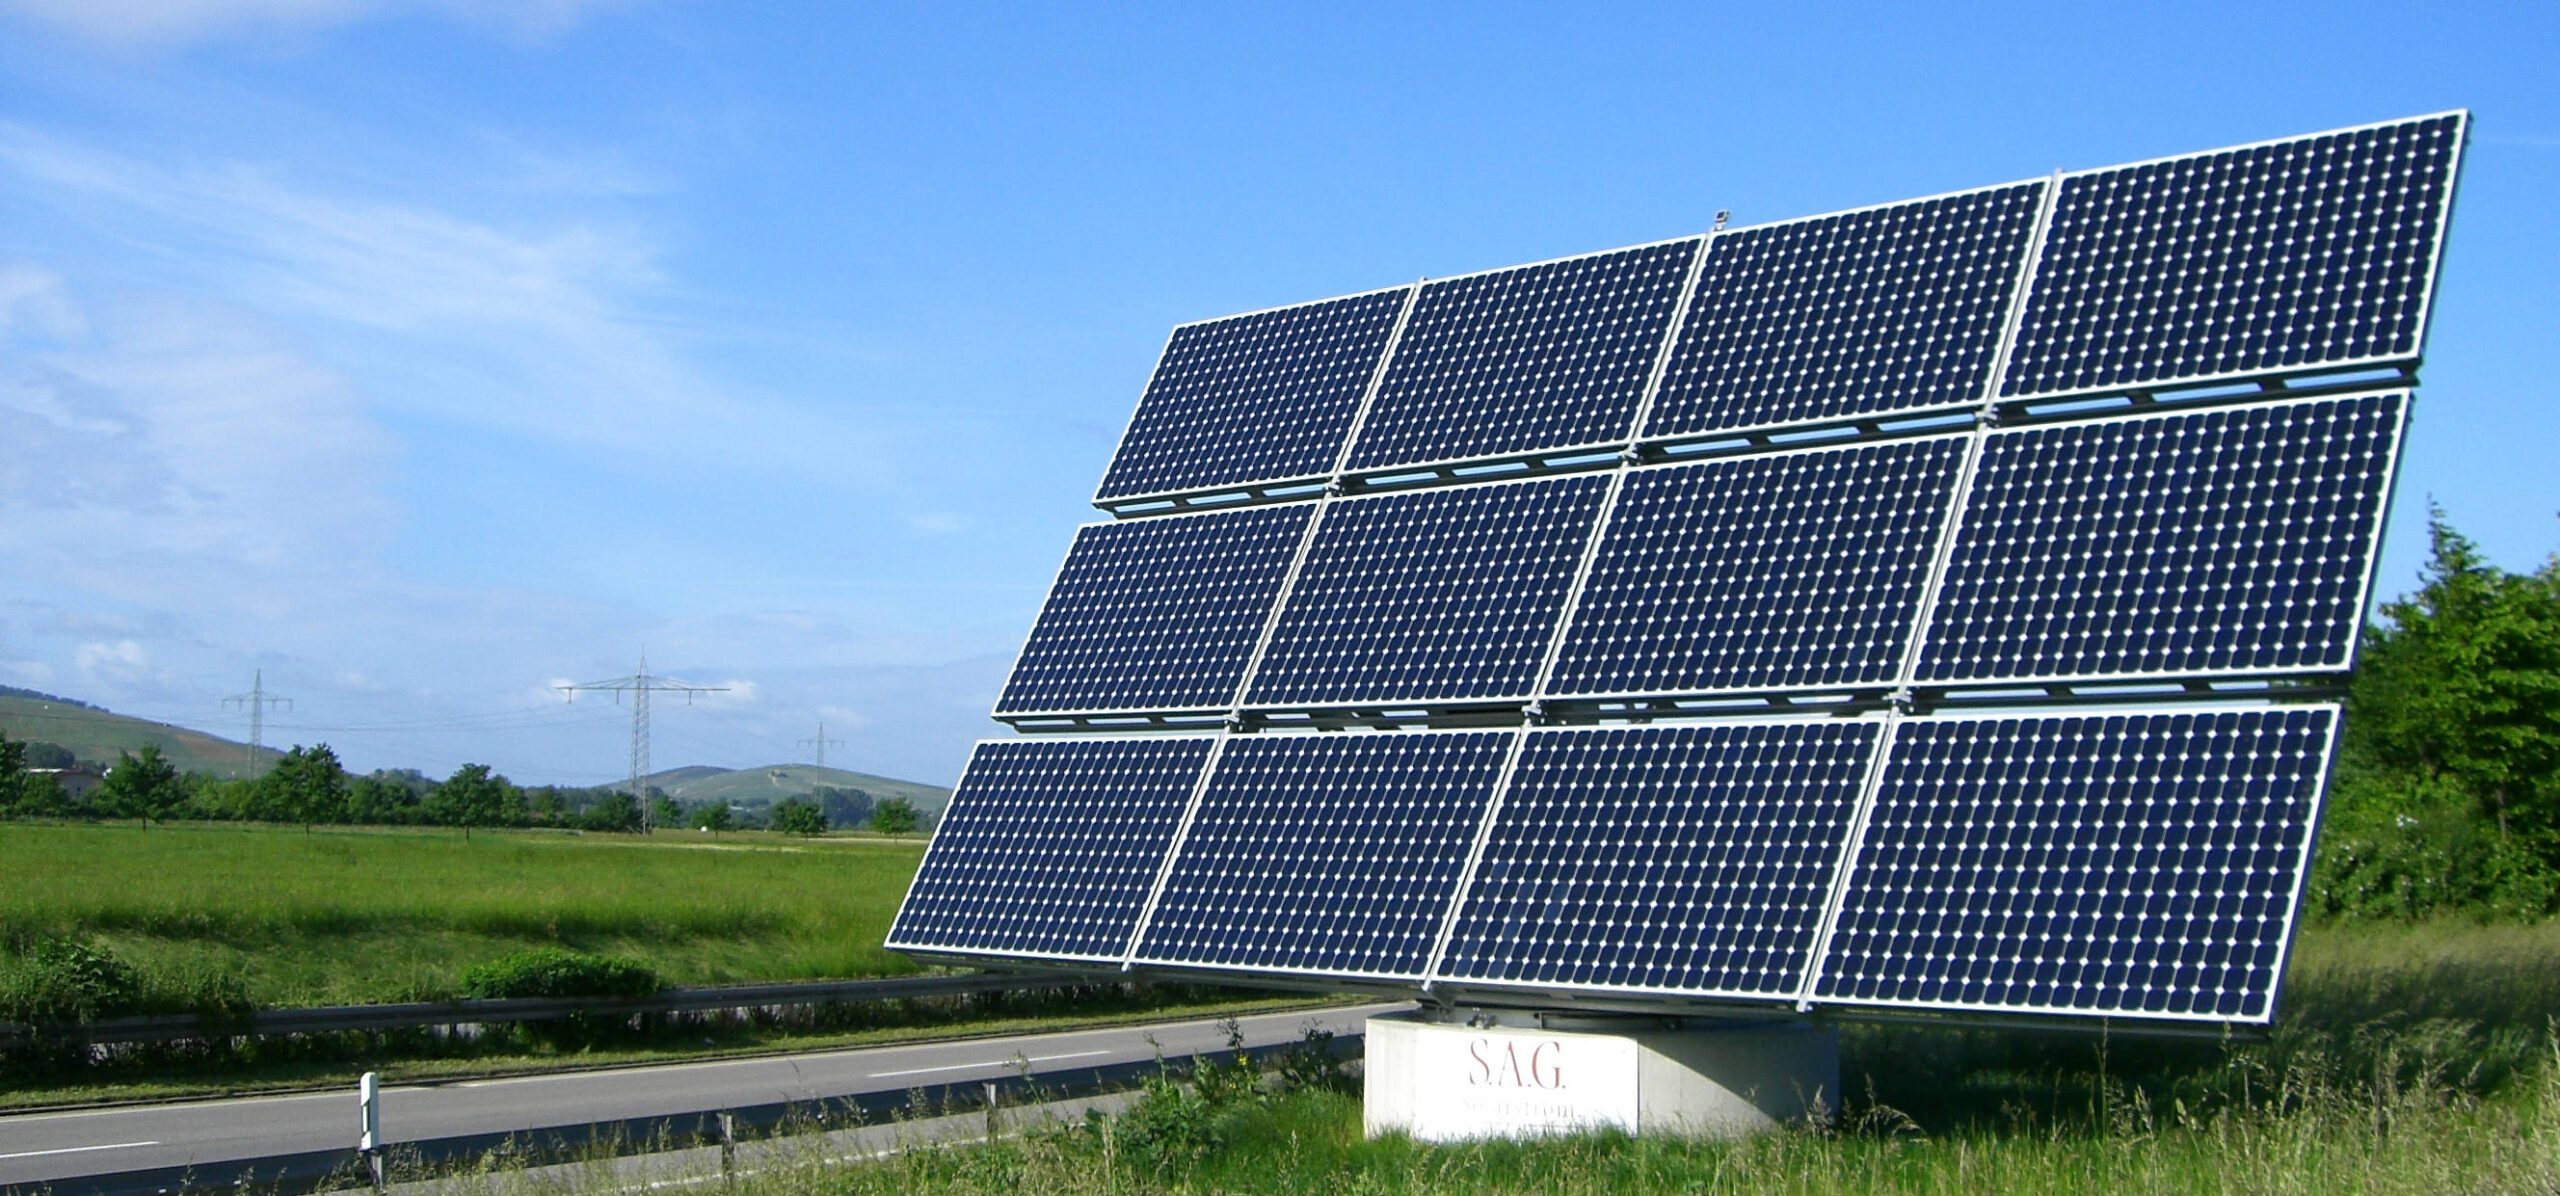 8 New Solar Power Technologies in 2021